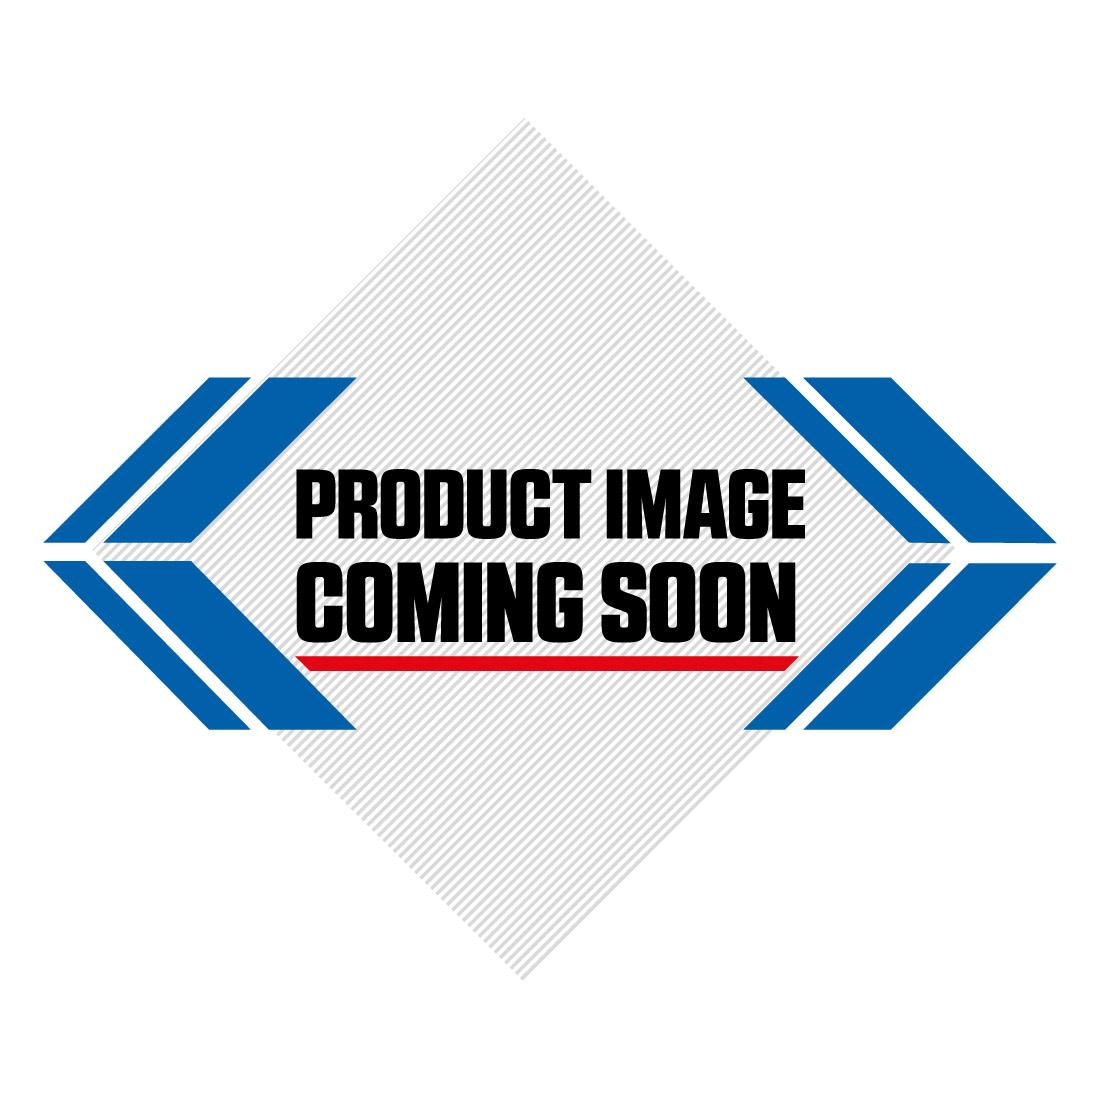 Silkolene Comp 4 10w-40 XP Ester Based Semi Synthetic Bike Engine Oil - 4 Cube Image-3